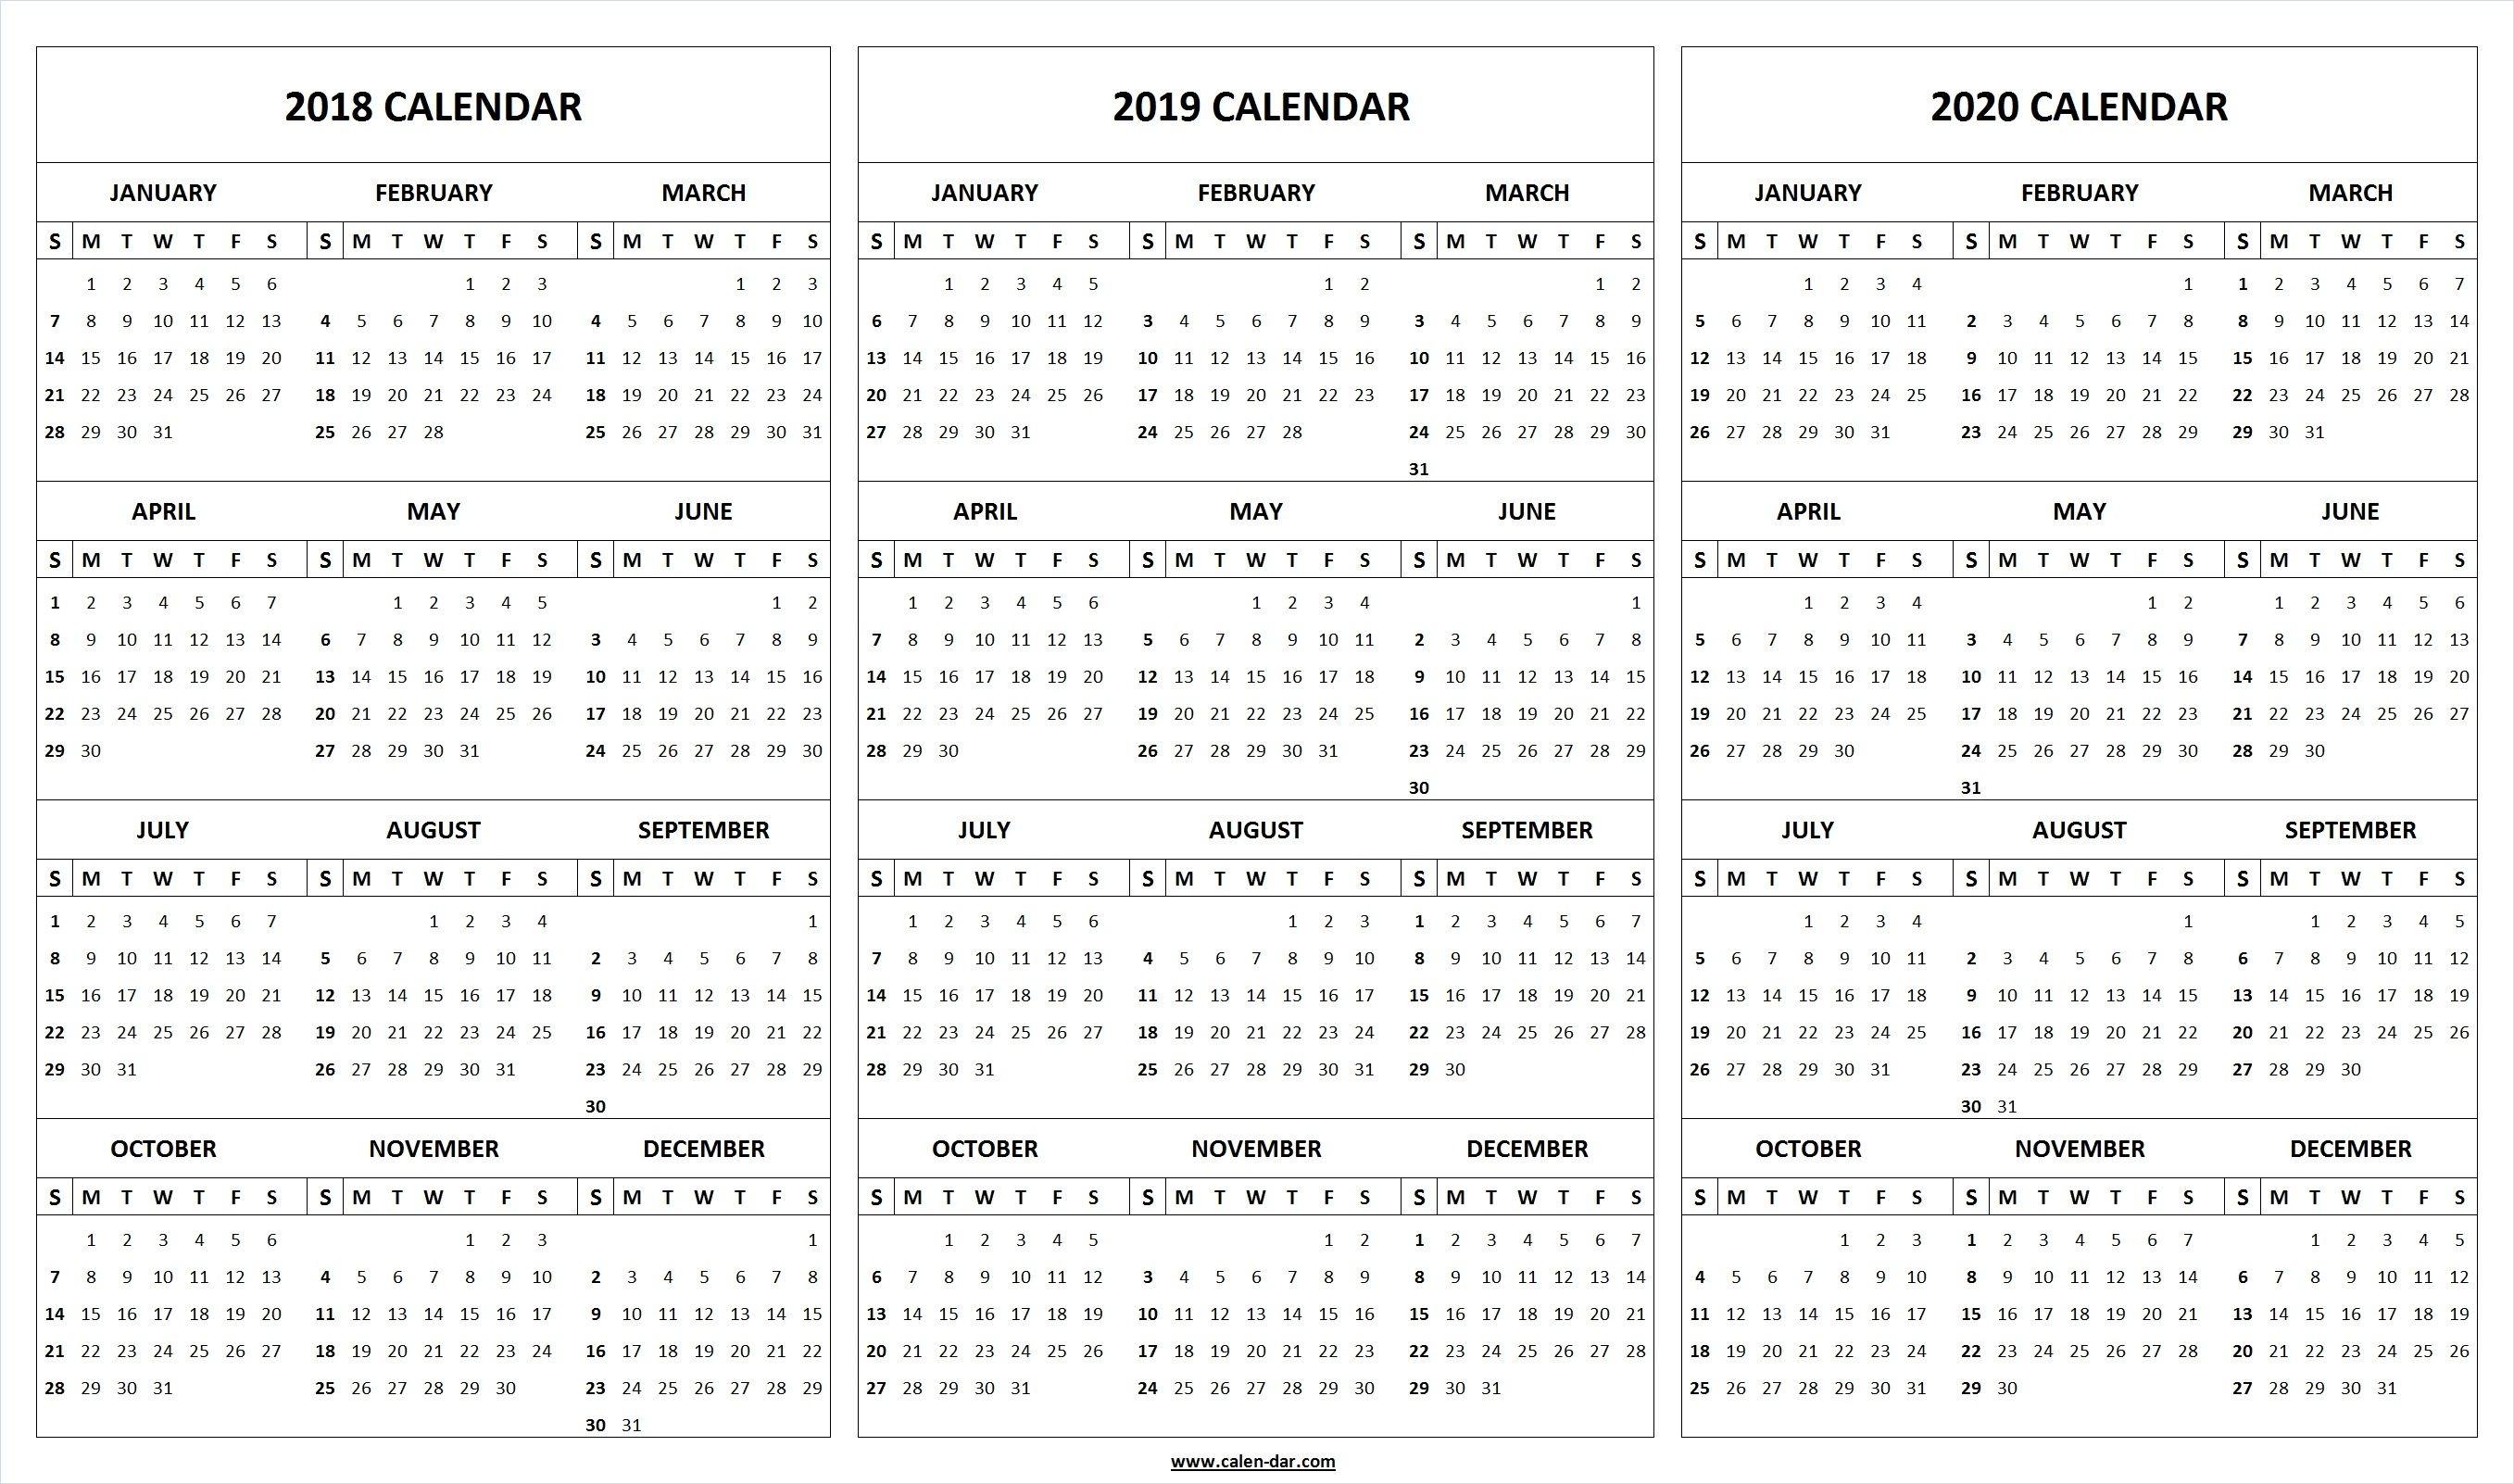 Print Blank 2018 2019 2020 Calendar Template | Organize! | Printable regarding Edit Free Calendar Template 2019-2020